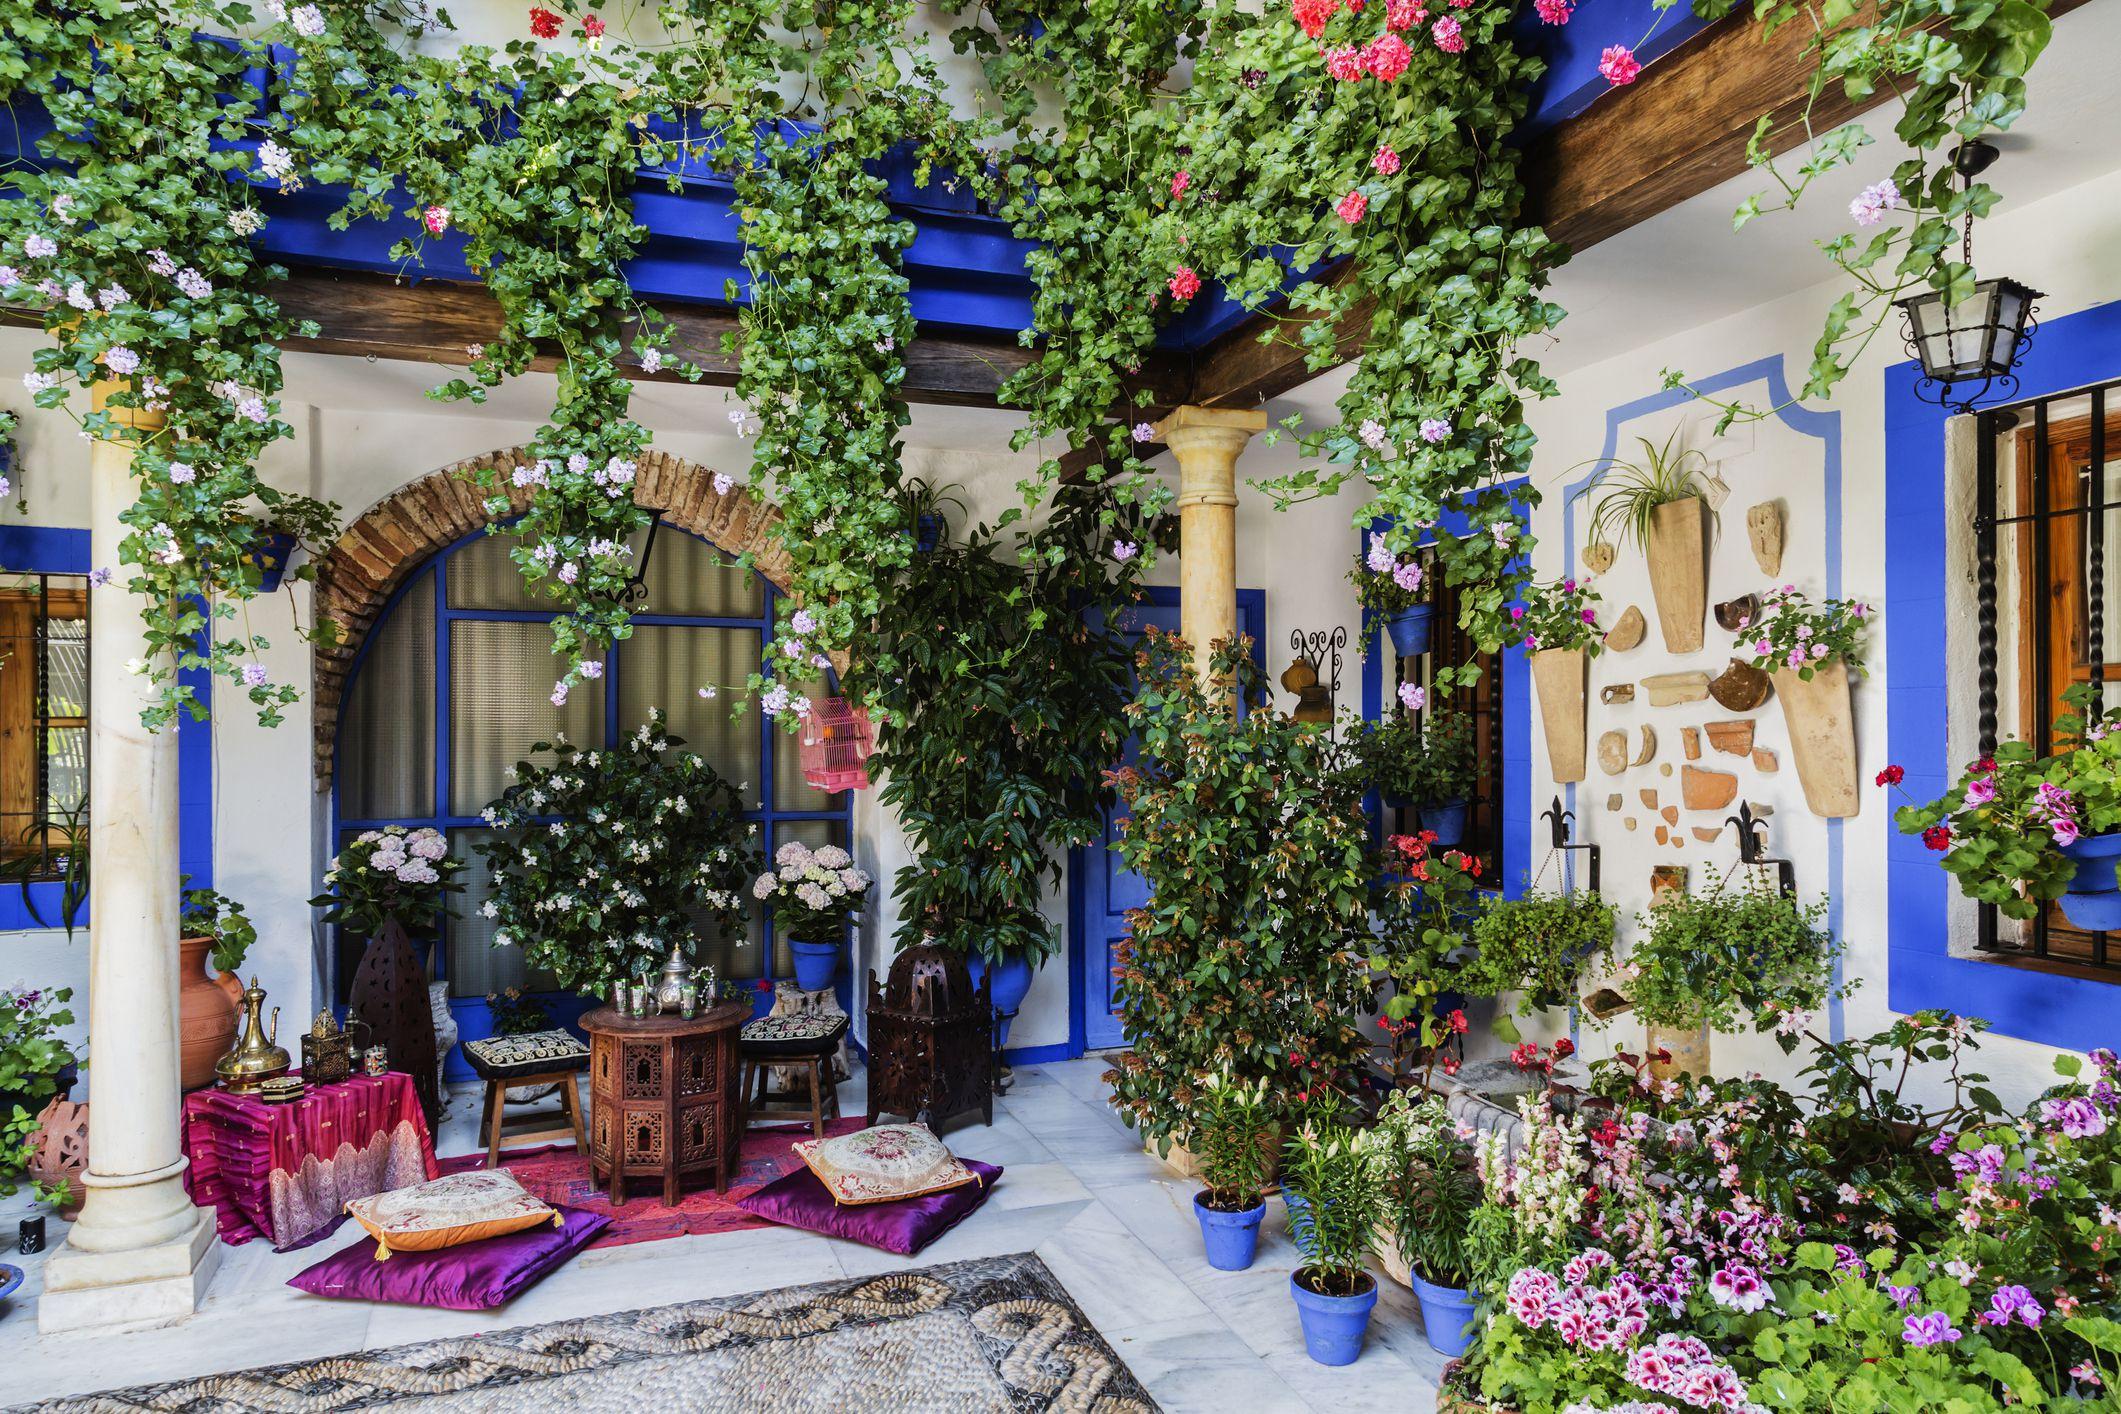 Blooming Courtyard Garden